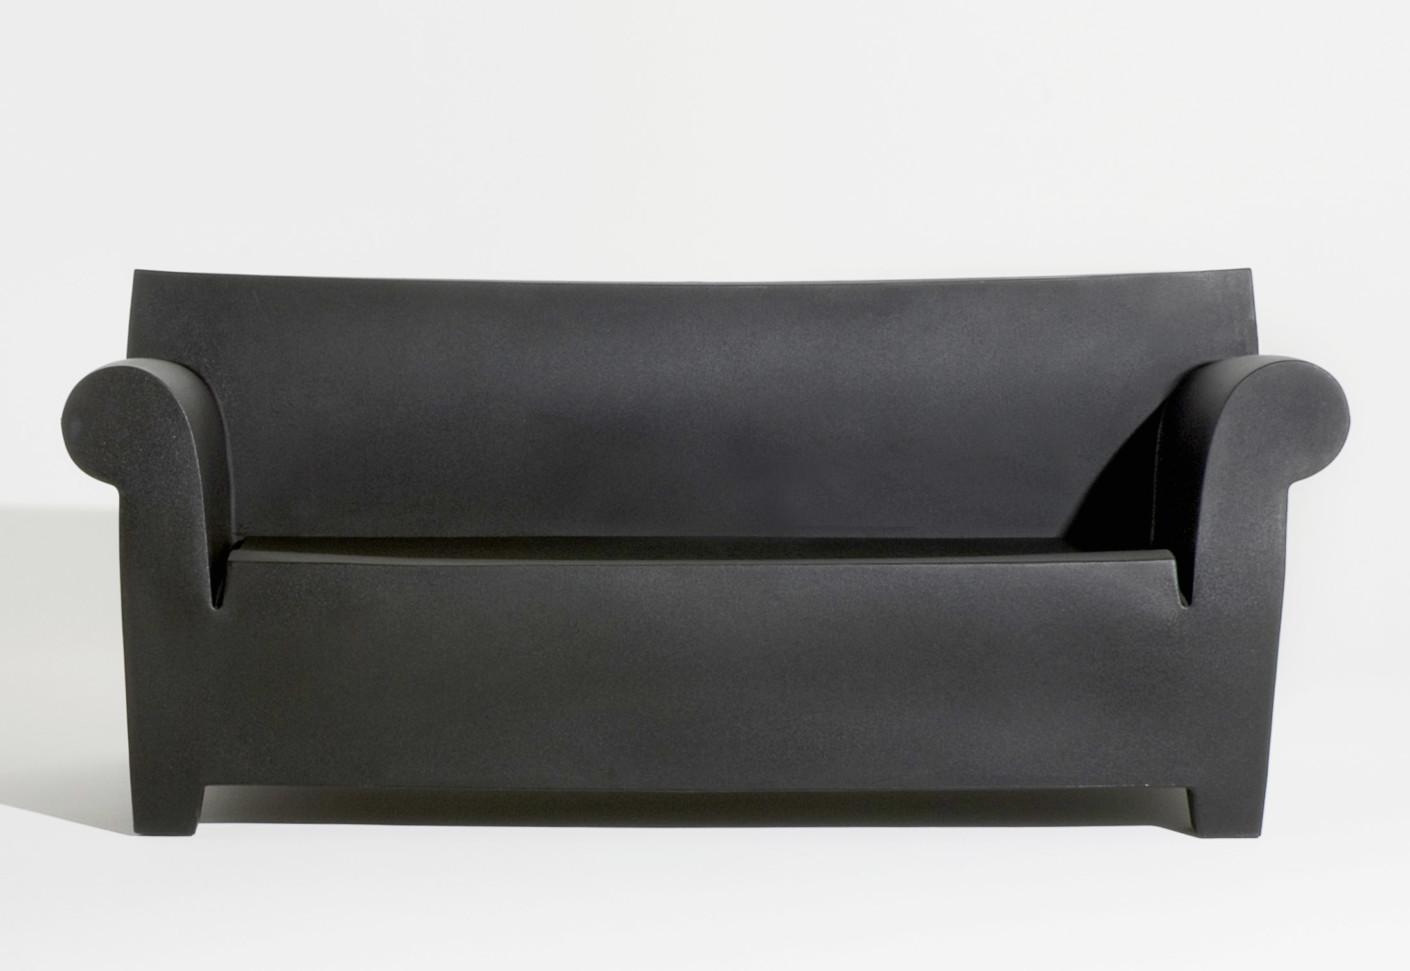 kartell bubble club sofa gebraucht chadwick sears von stylepark